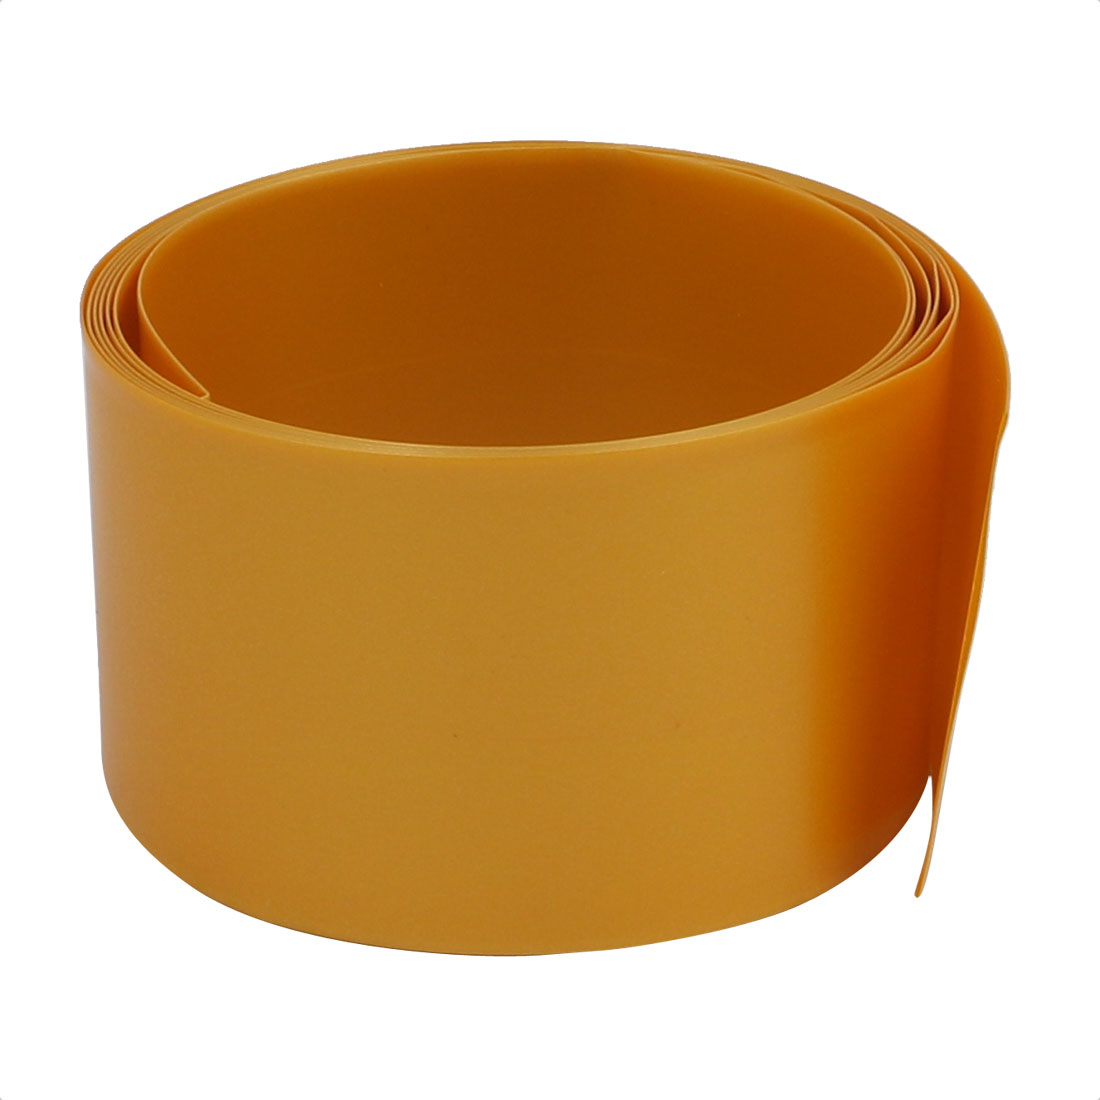 29.5mm Flat Width 1M Length PVC Heat Shrinkable Tube Gold Tone for 18650 Battery